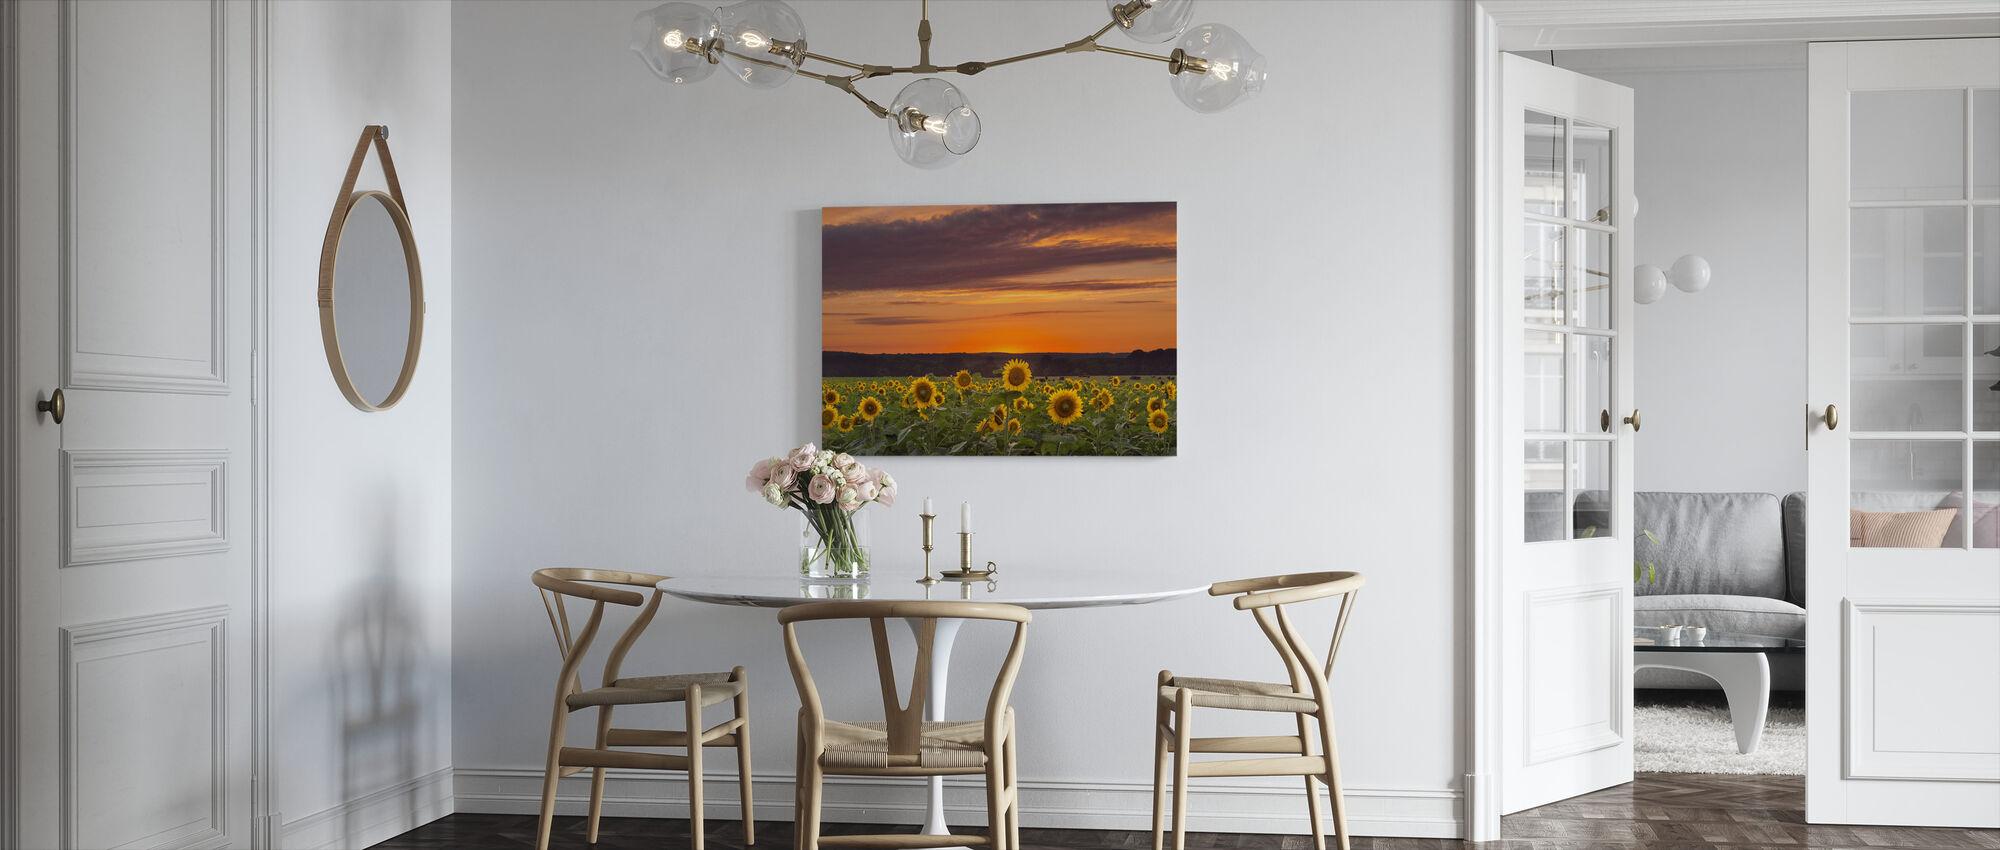 Sunset over Sunflowers - Canvas print - Kitchen